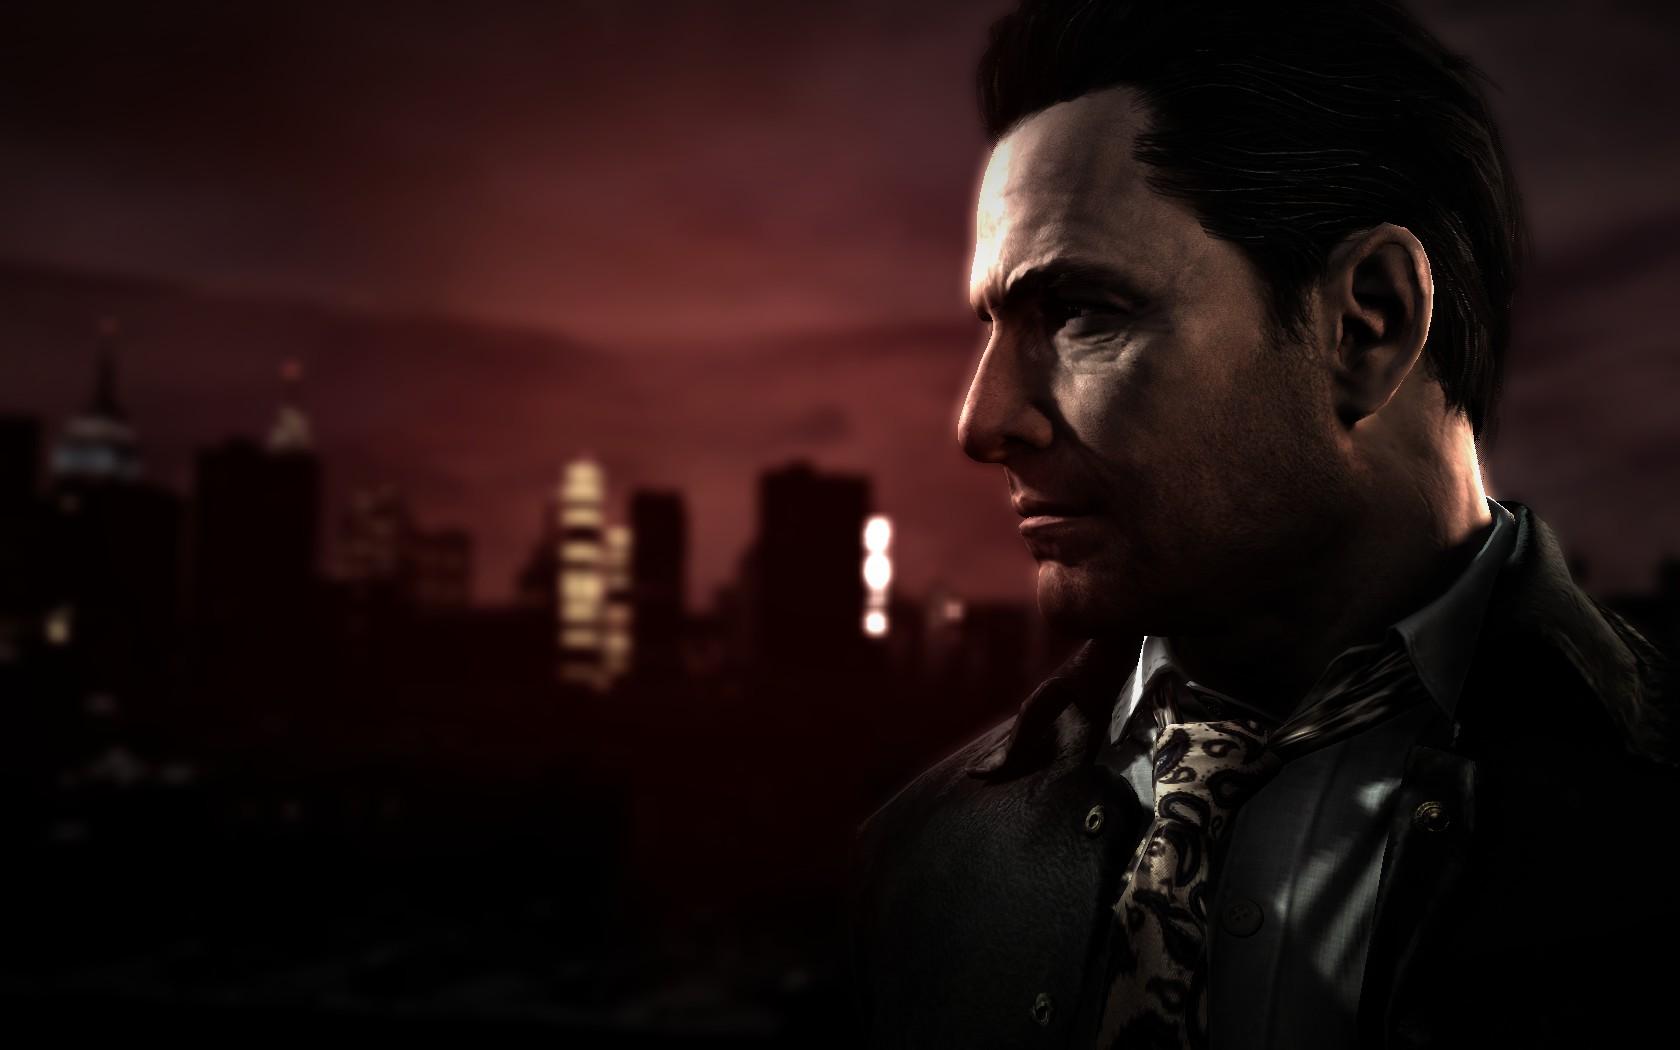 Max Payne 3 MP1 wallpaper by Teimurazor 1680x1050